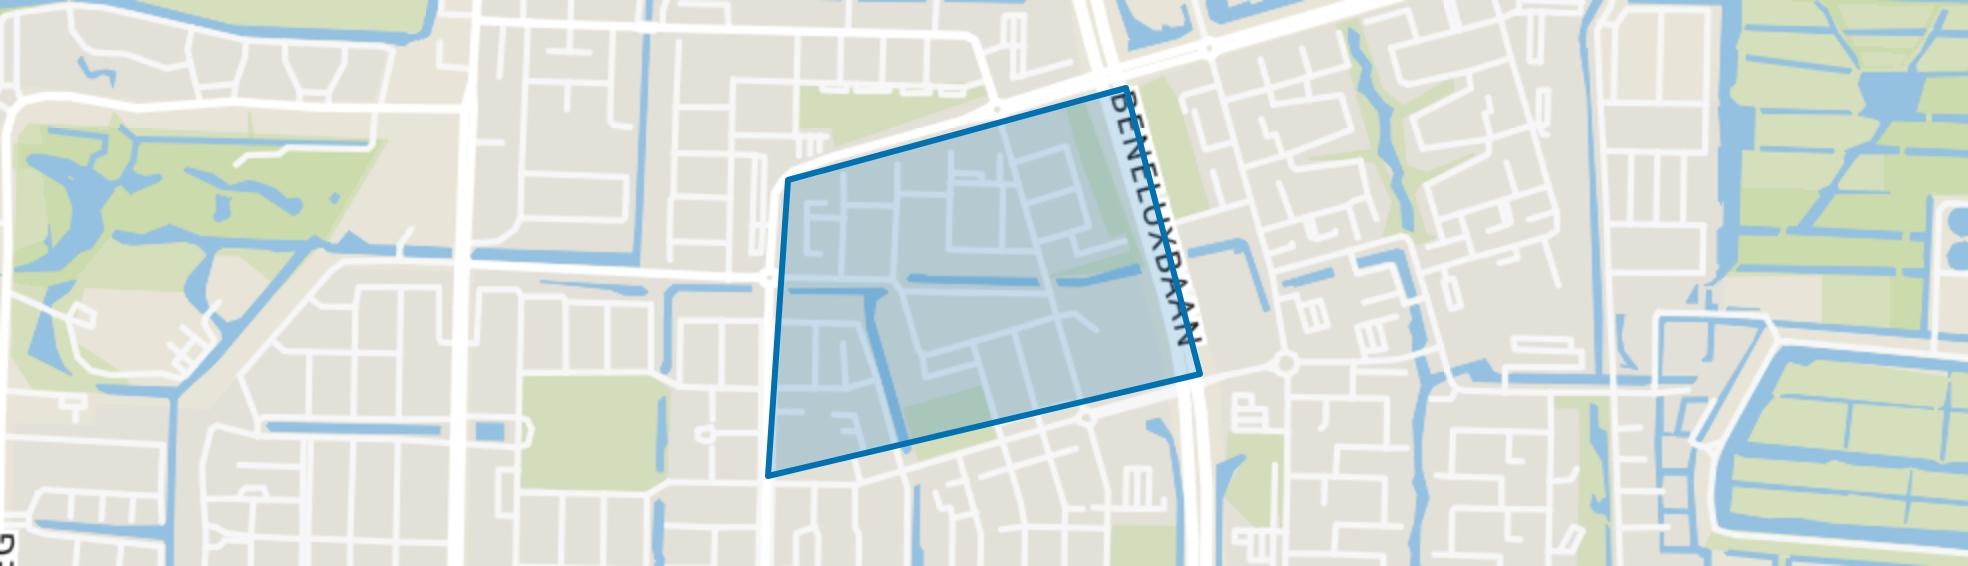 Vredeveldbuurt, Amstelveen map